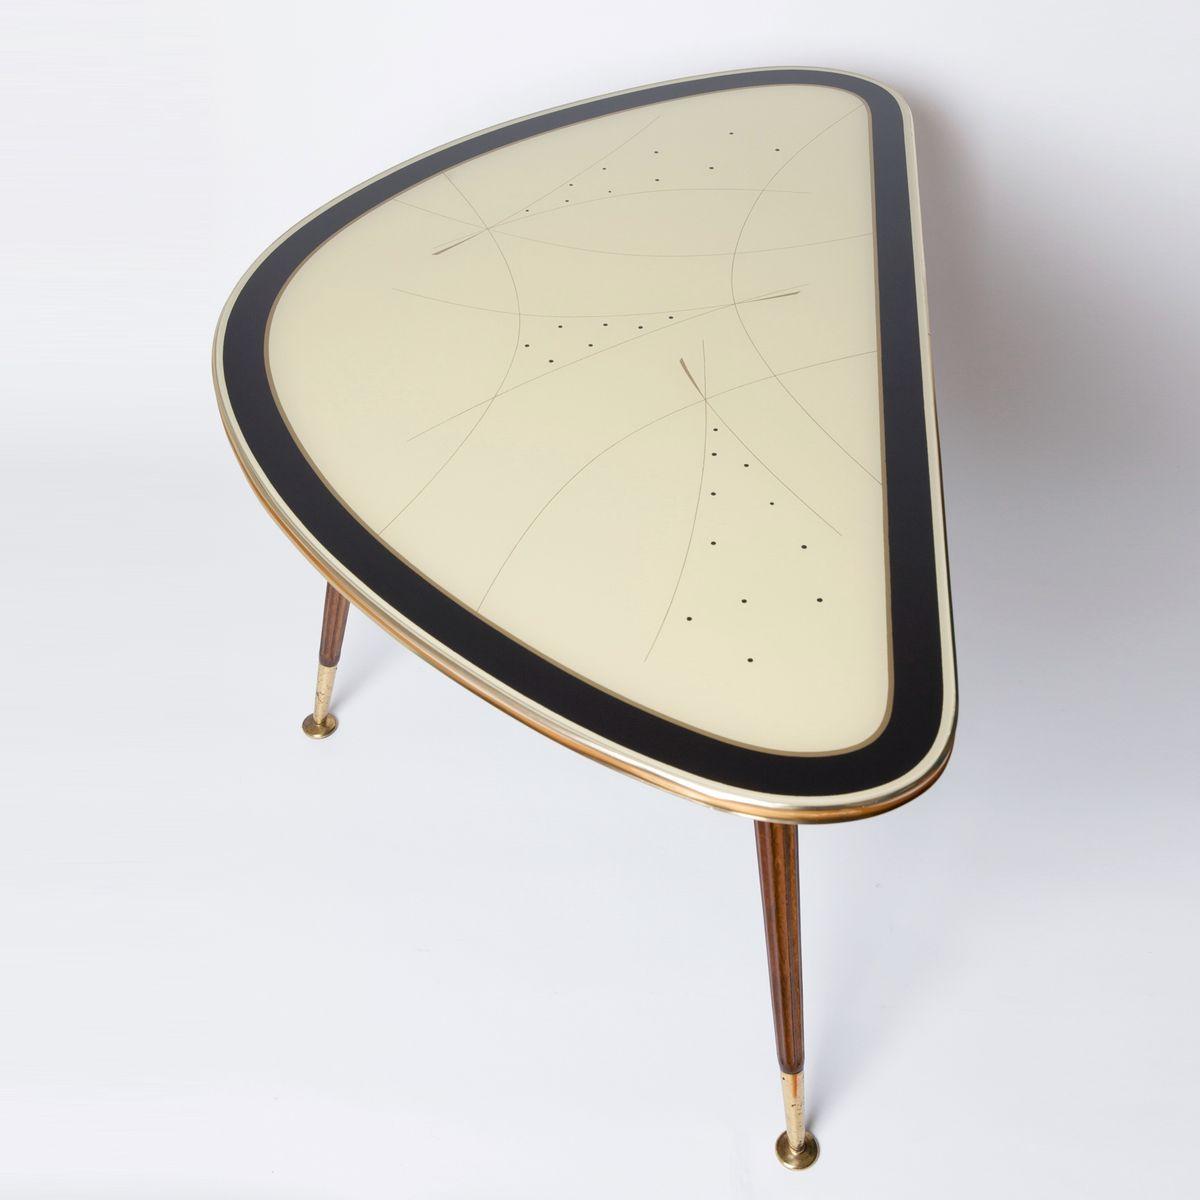 MidCentury Brass Cocktail Table from IIse Möbel, 1950s  -> Vintage Möbel Pamono